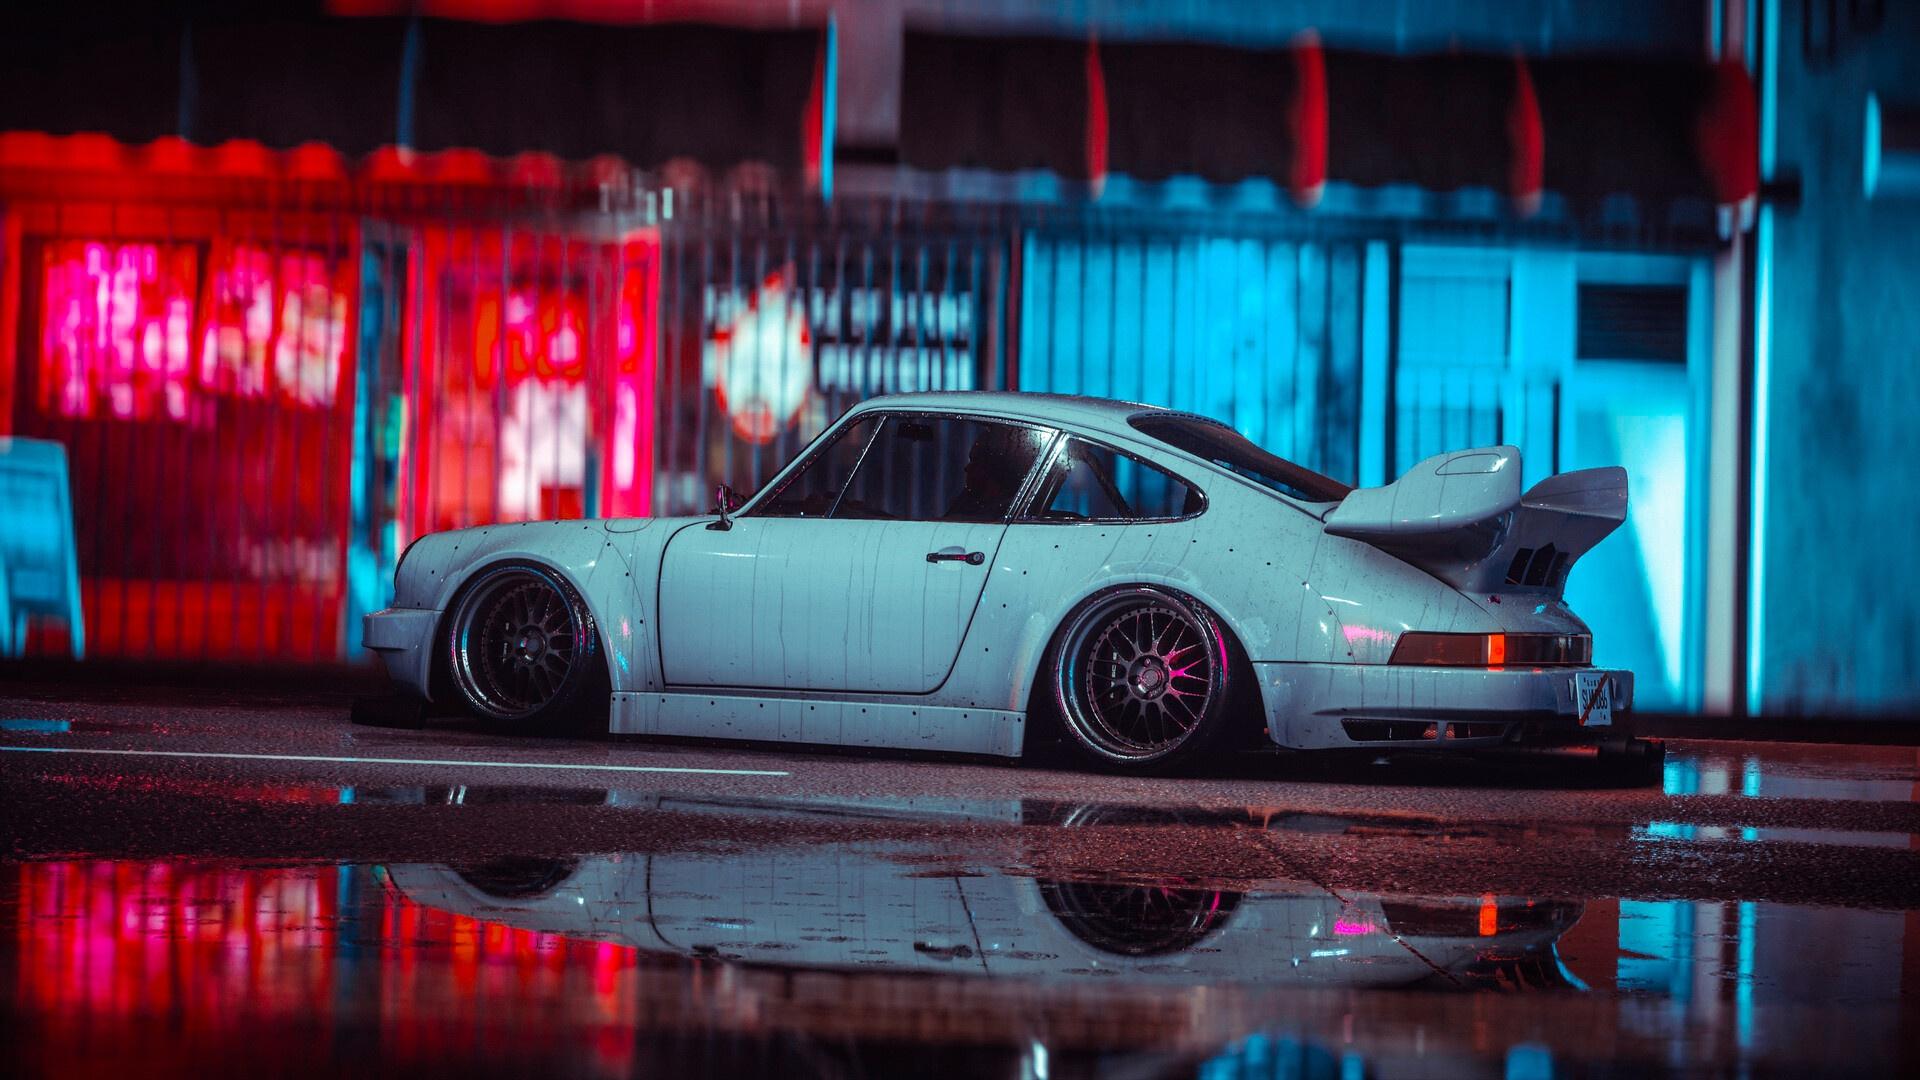 General 1920x1080 car vehicle Porsche 911 render digital art Porsche